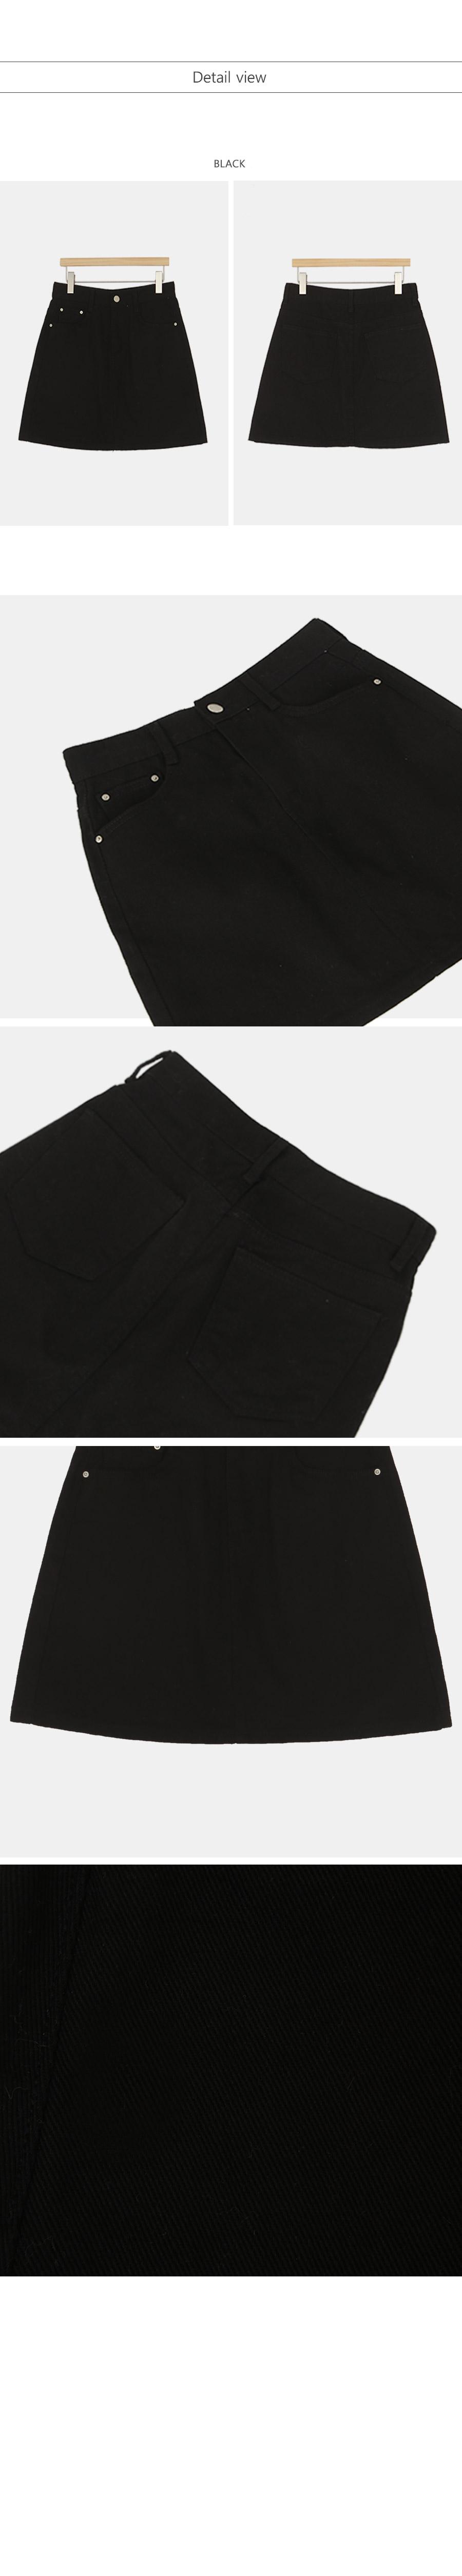 Decant mini sk / black